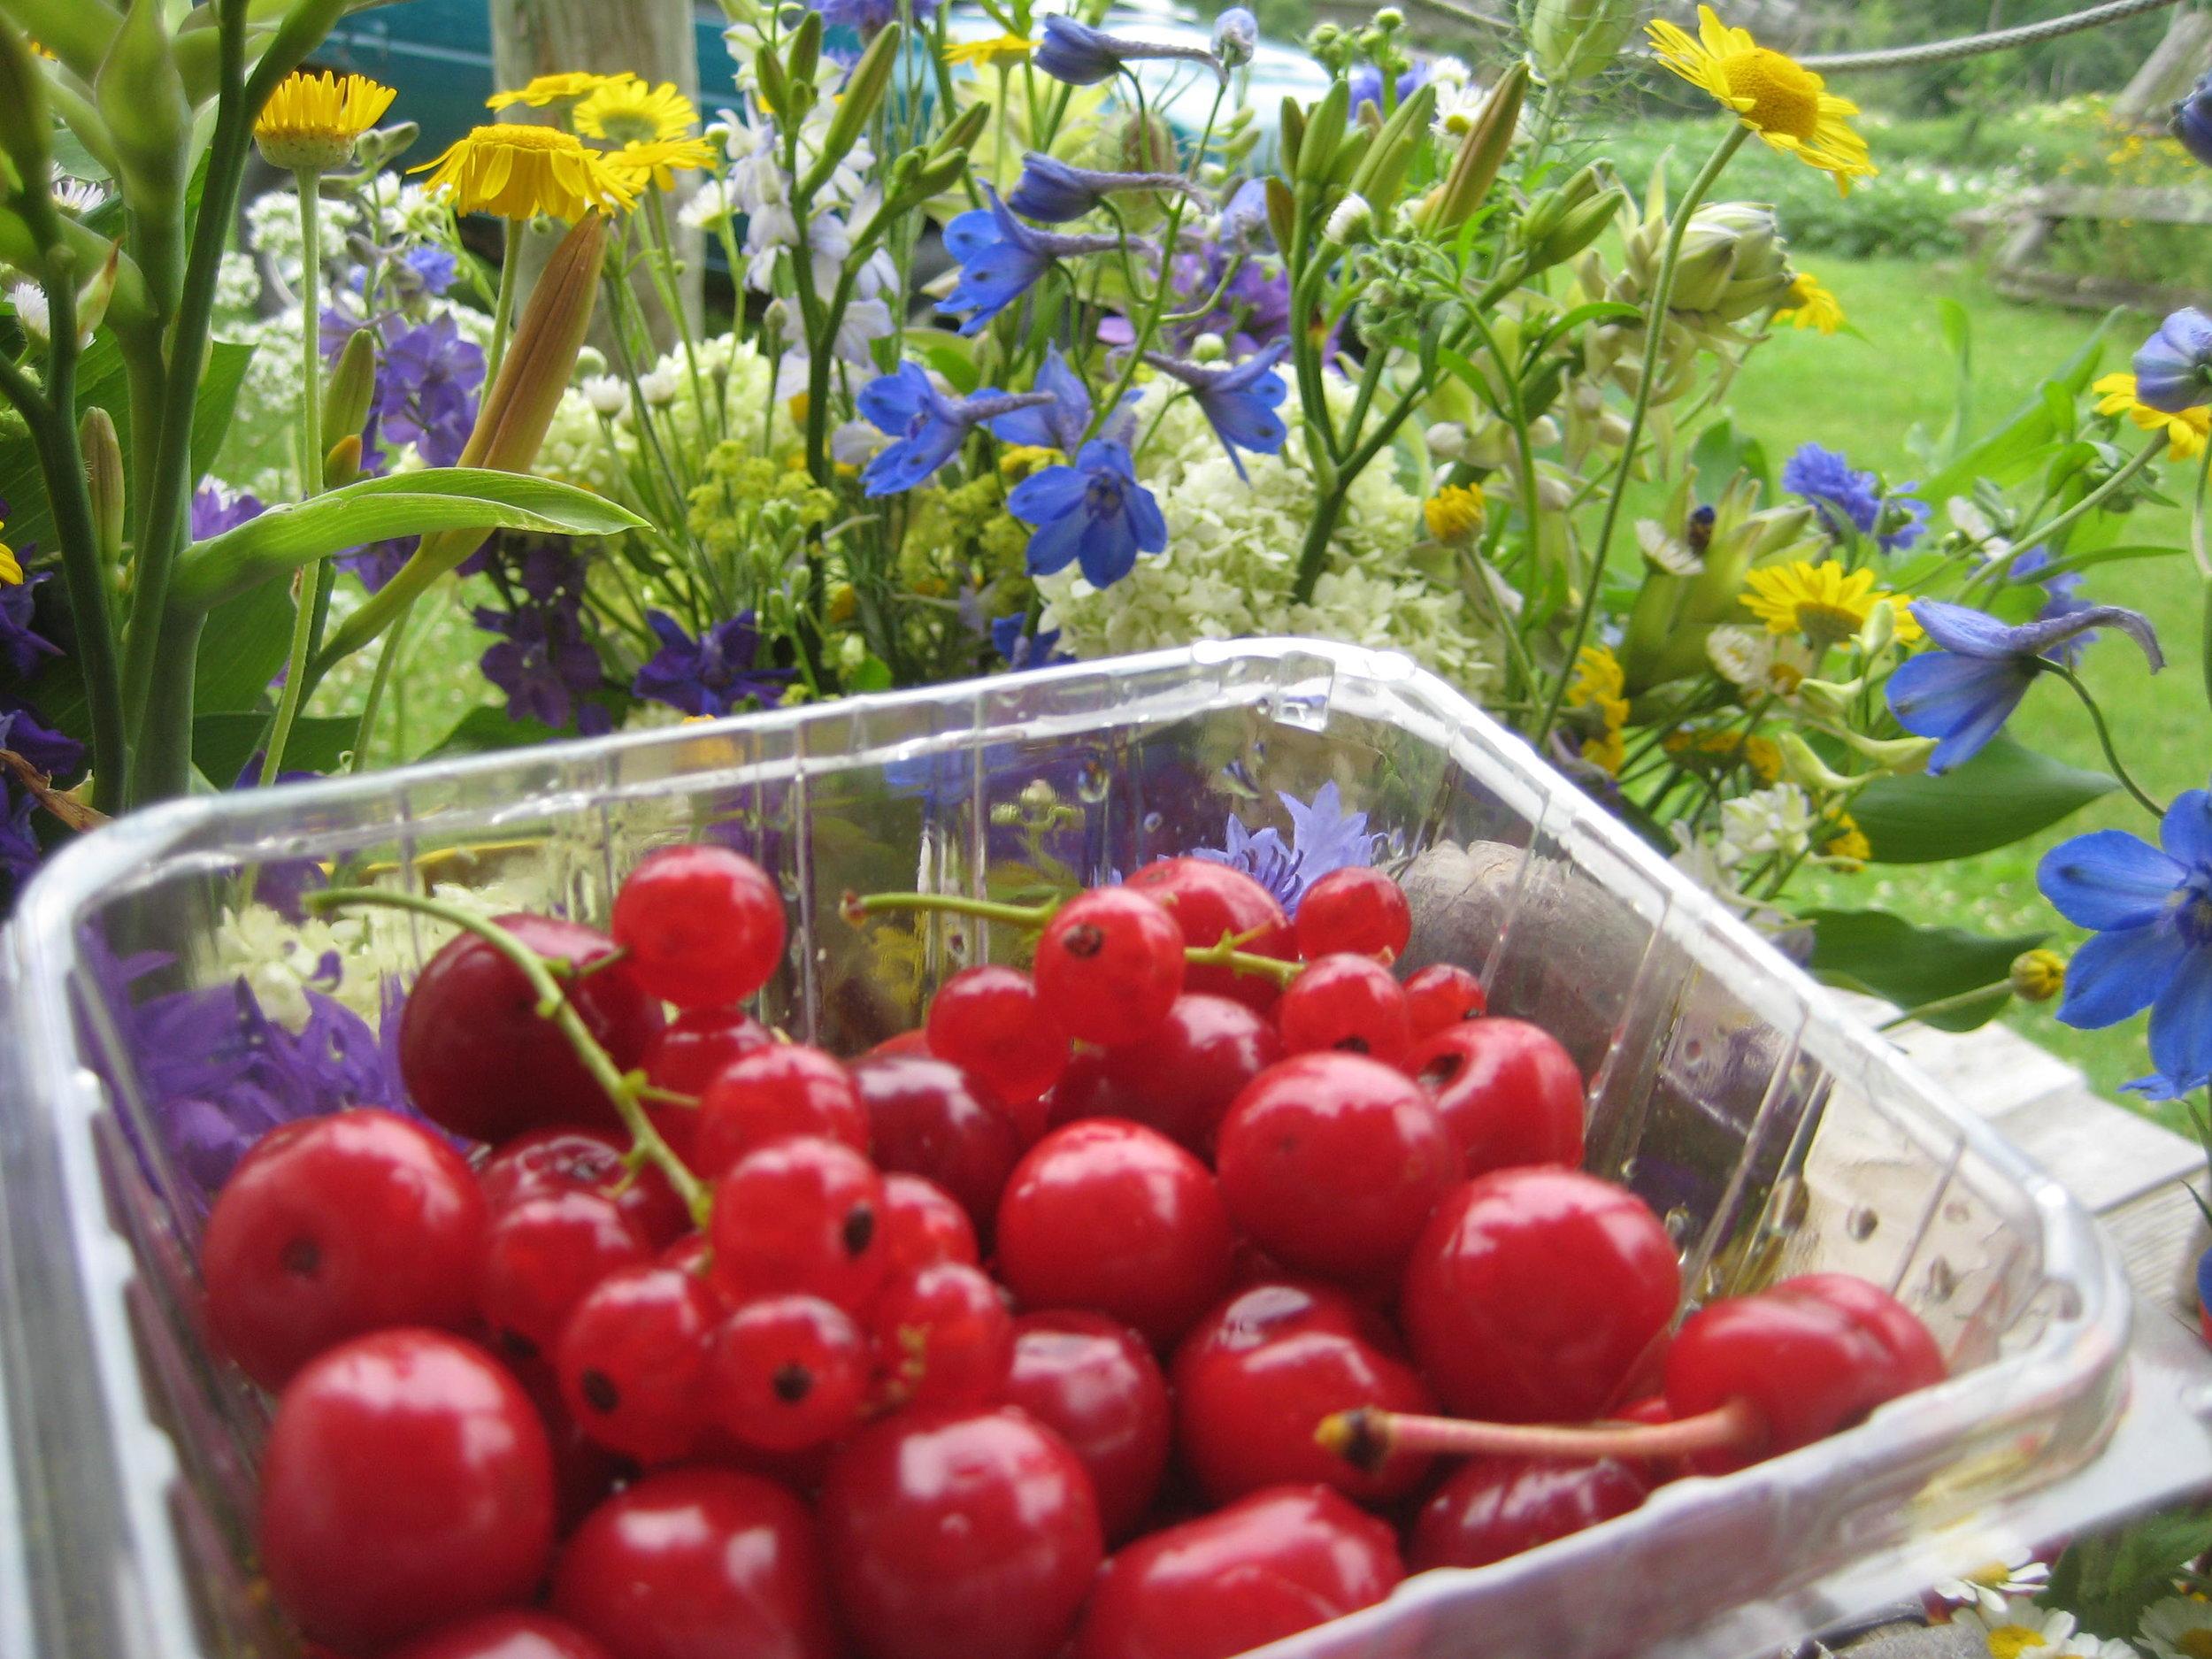 Currants, cherries, delphinium bliss